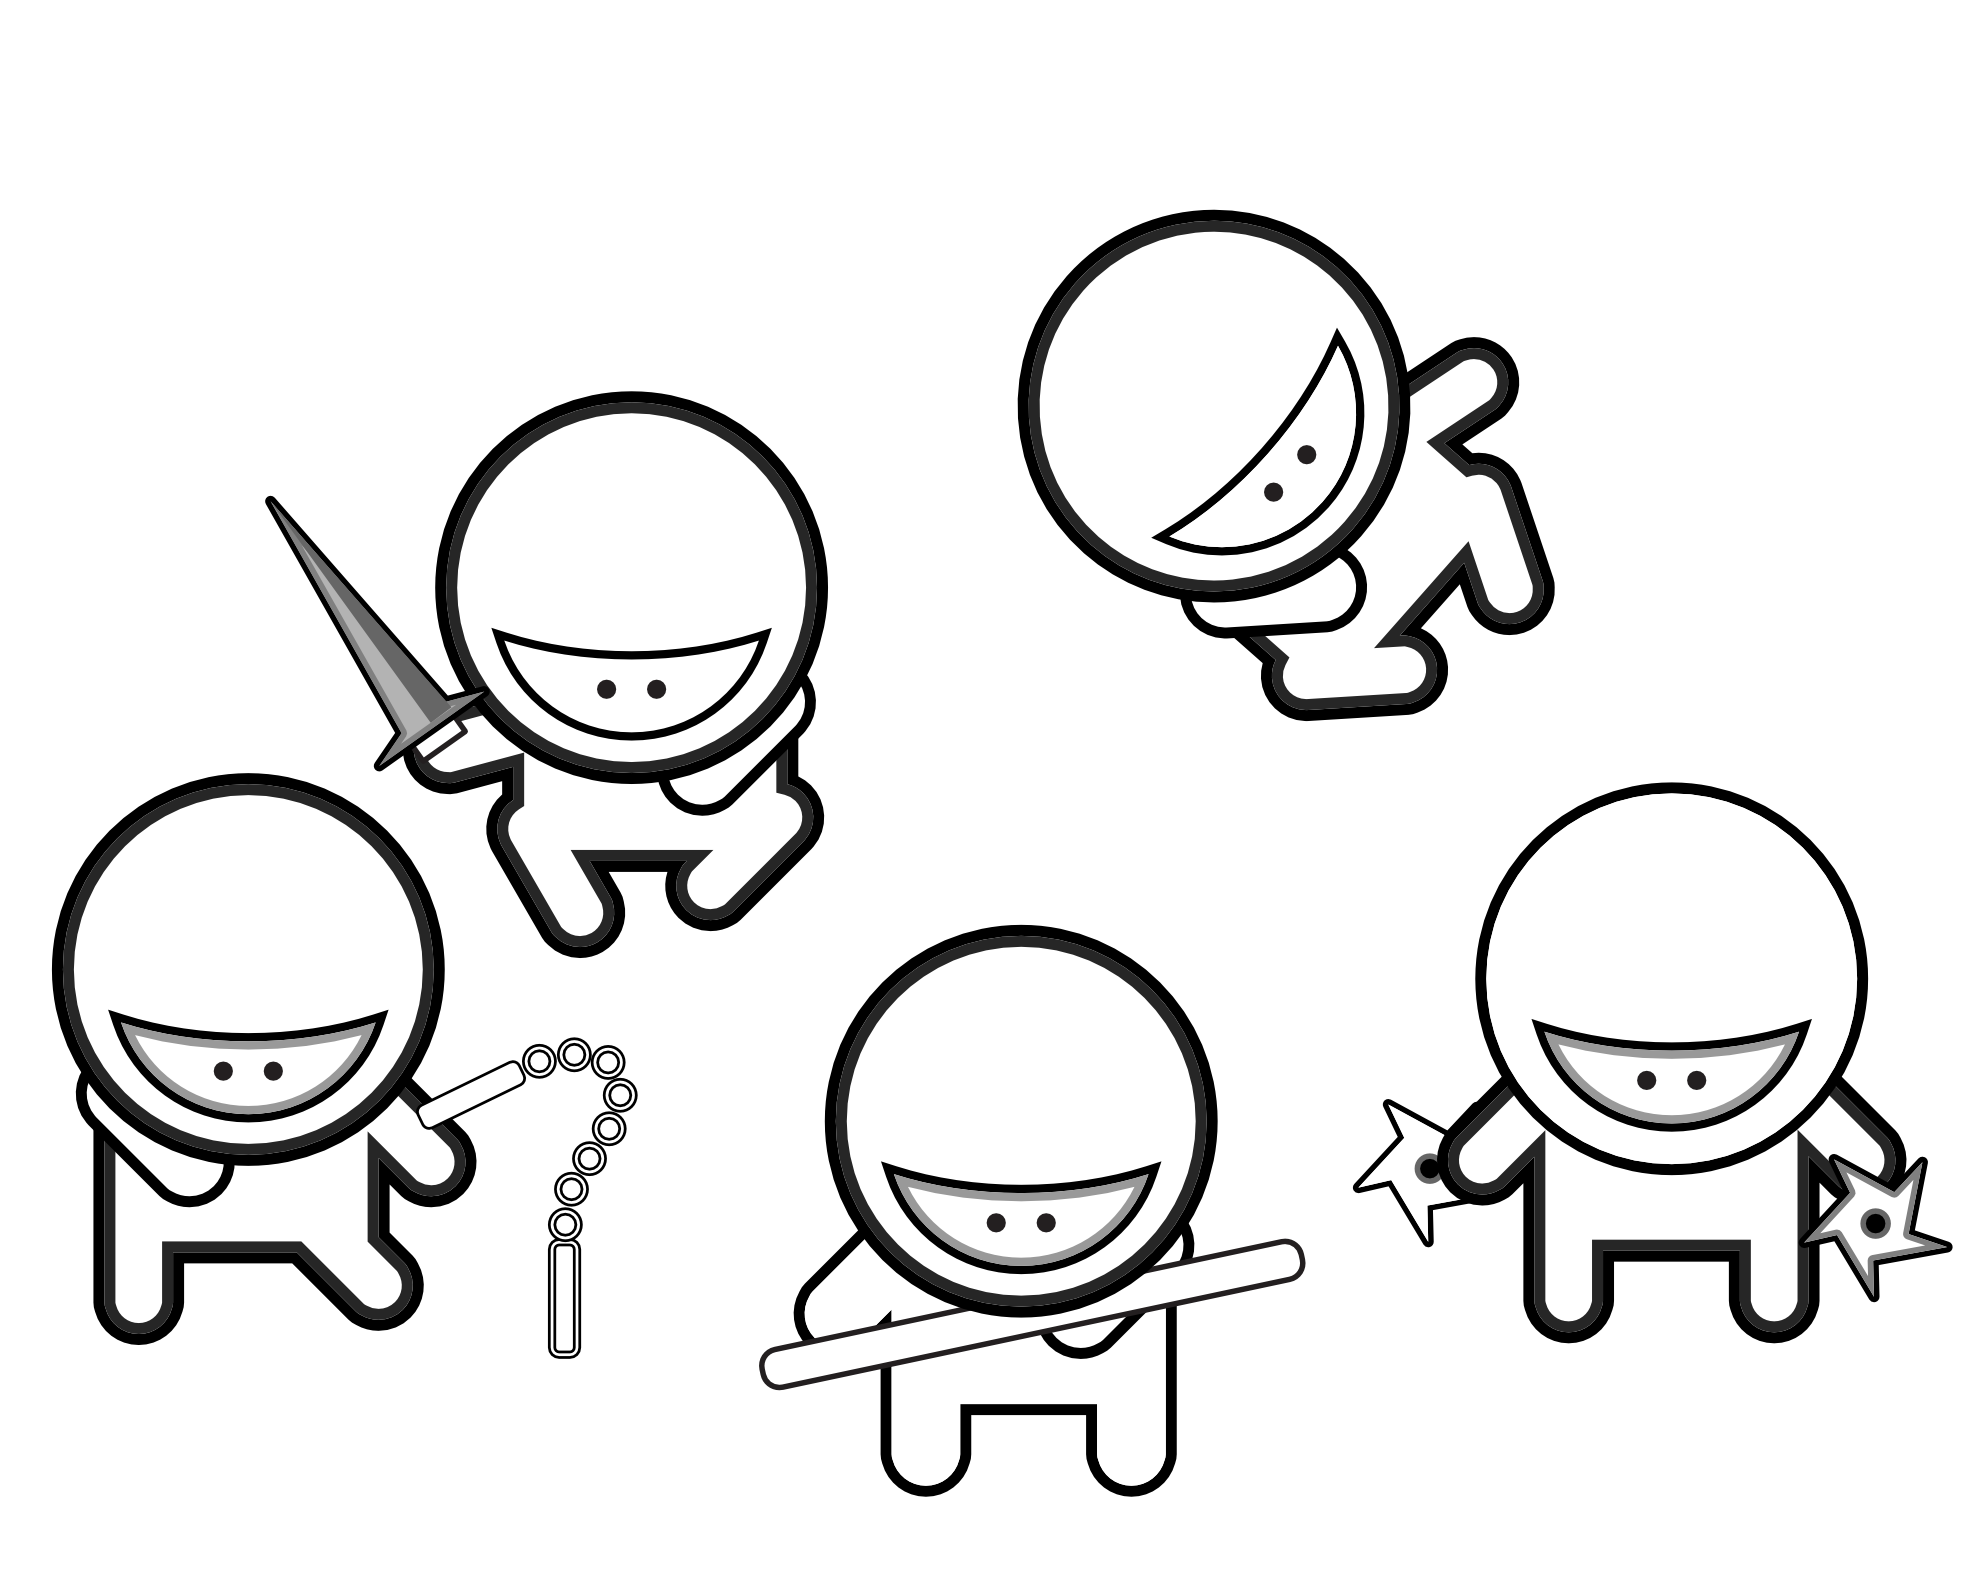 Ninja coloring pages free printable coloring home for Coloring page ninja